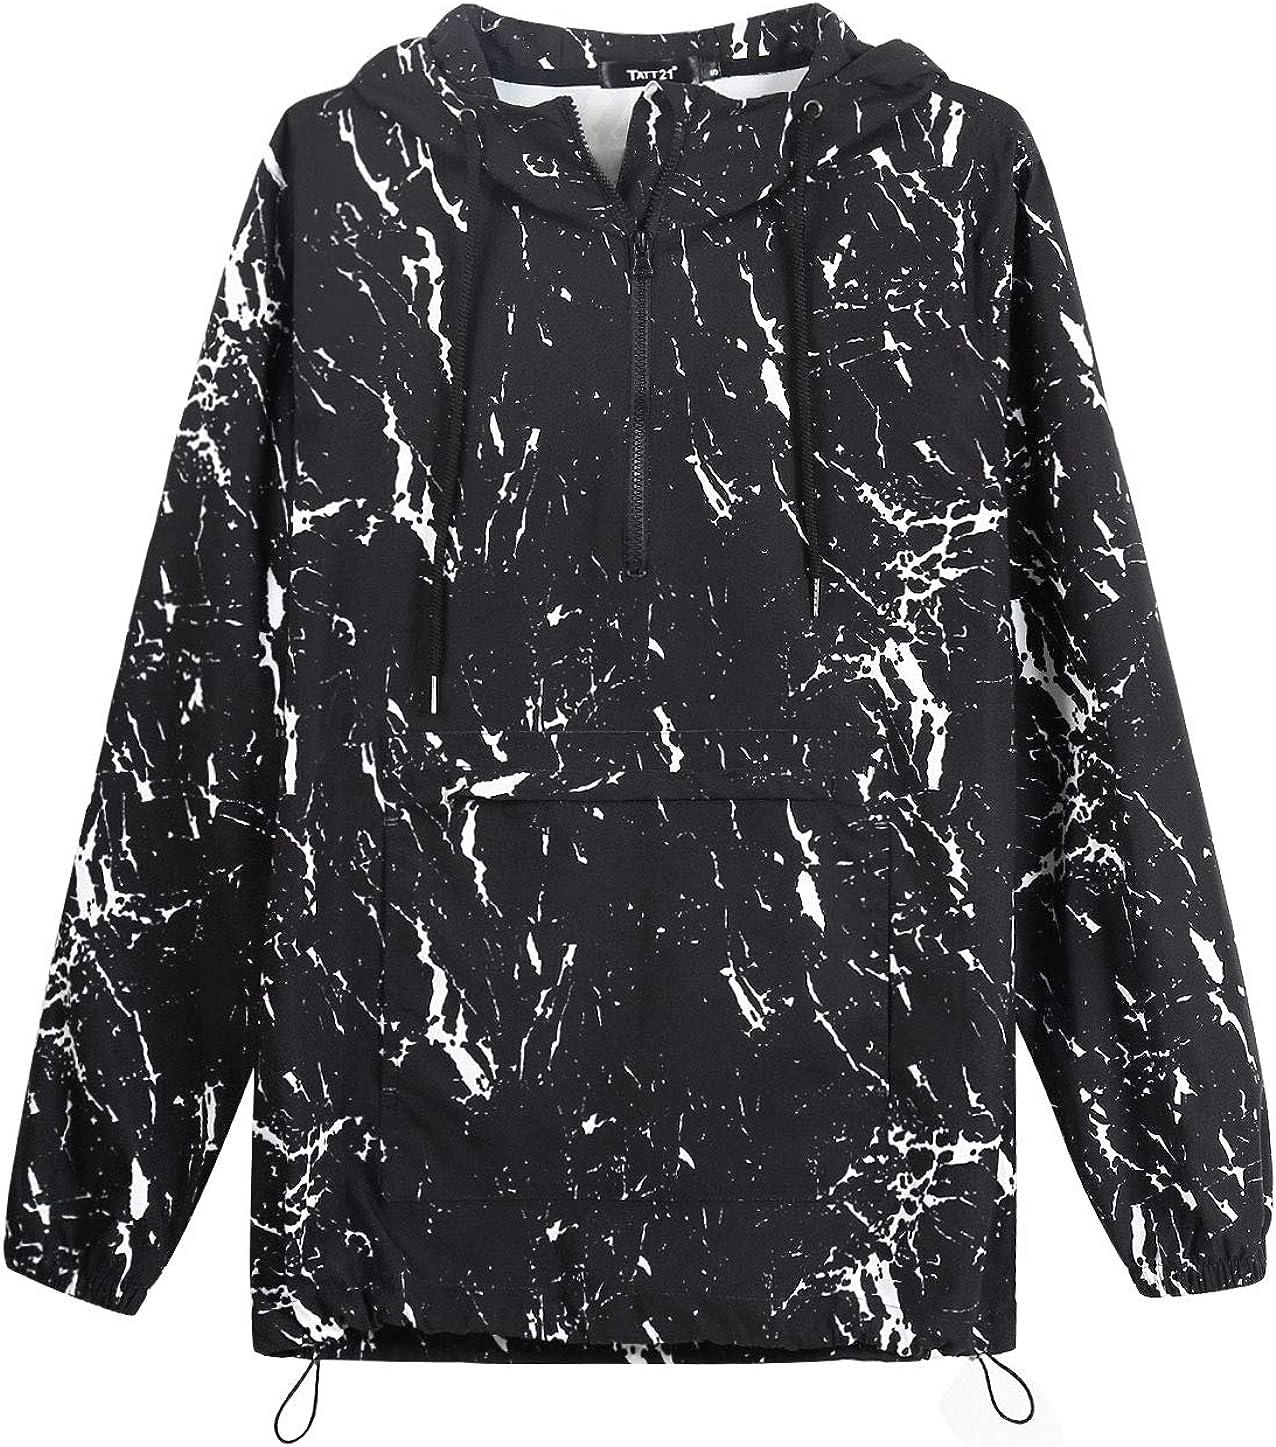 TATT 21 Men Printed Active Hoodies Paint Pattern Lightweight Windbreaker Pullover Half Zip Hooded